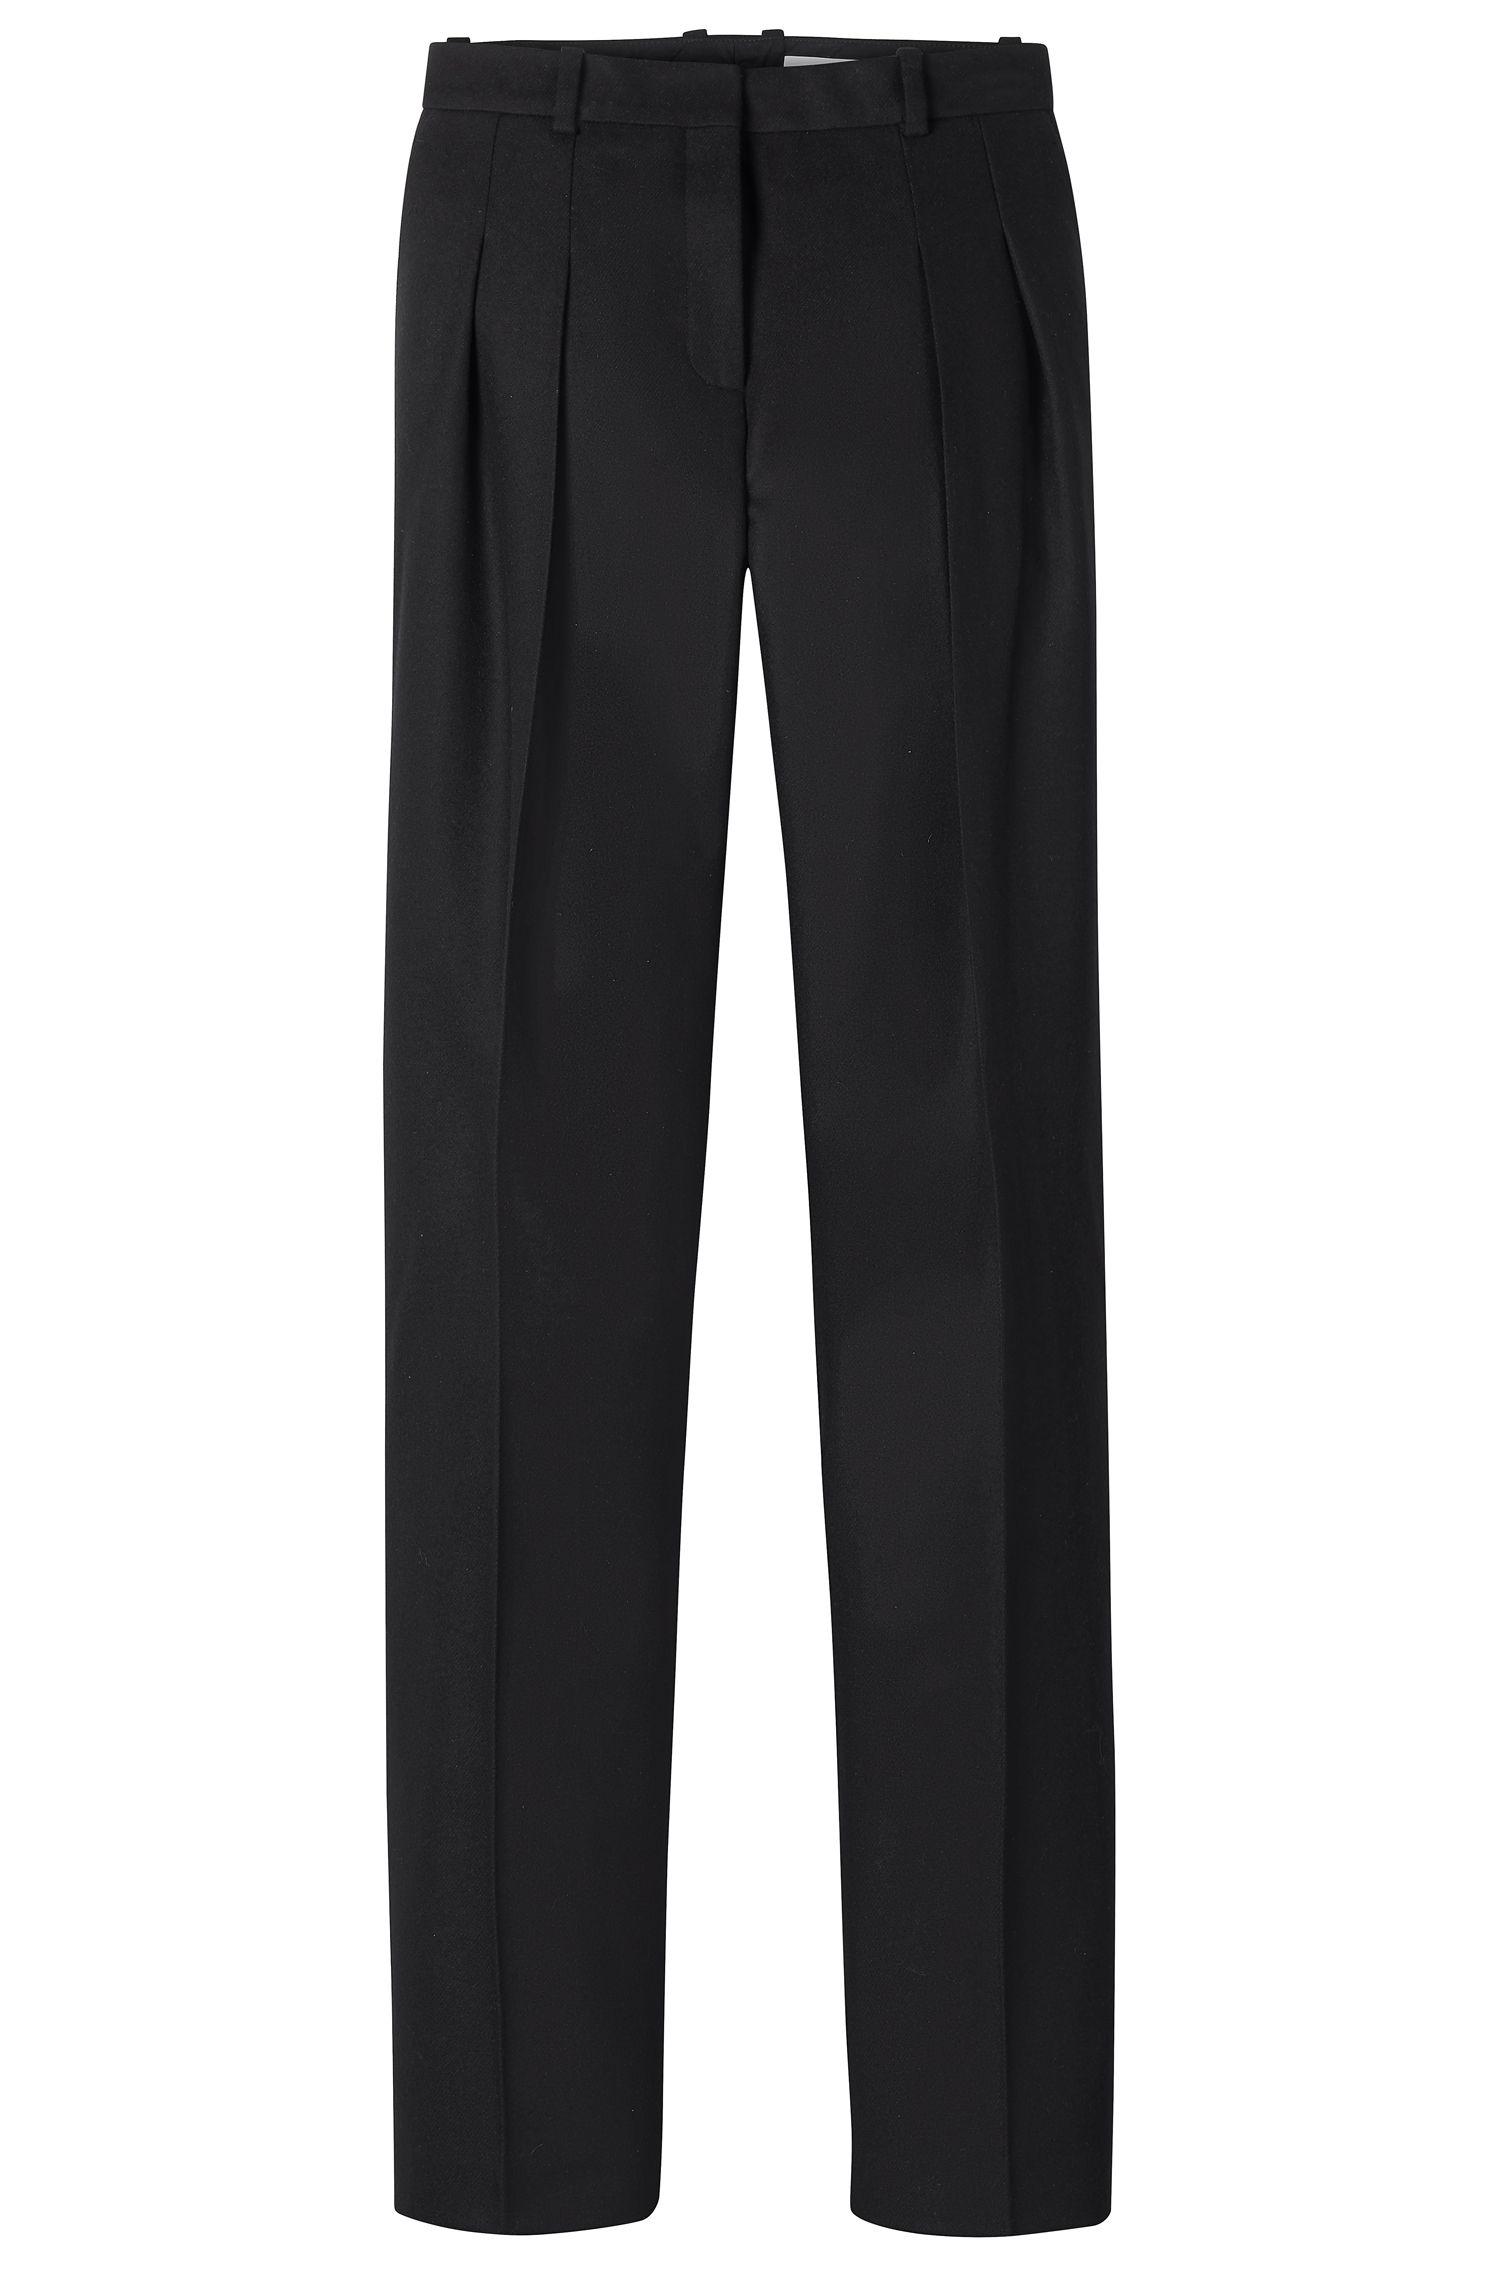 'FS_Temina' | Virgin Wool Cashmere Dress Pants